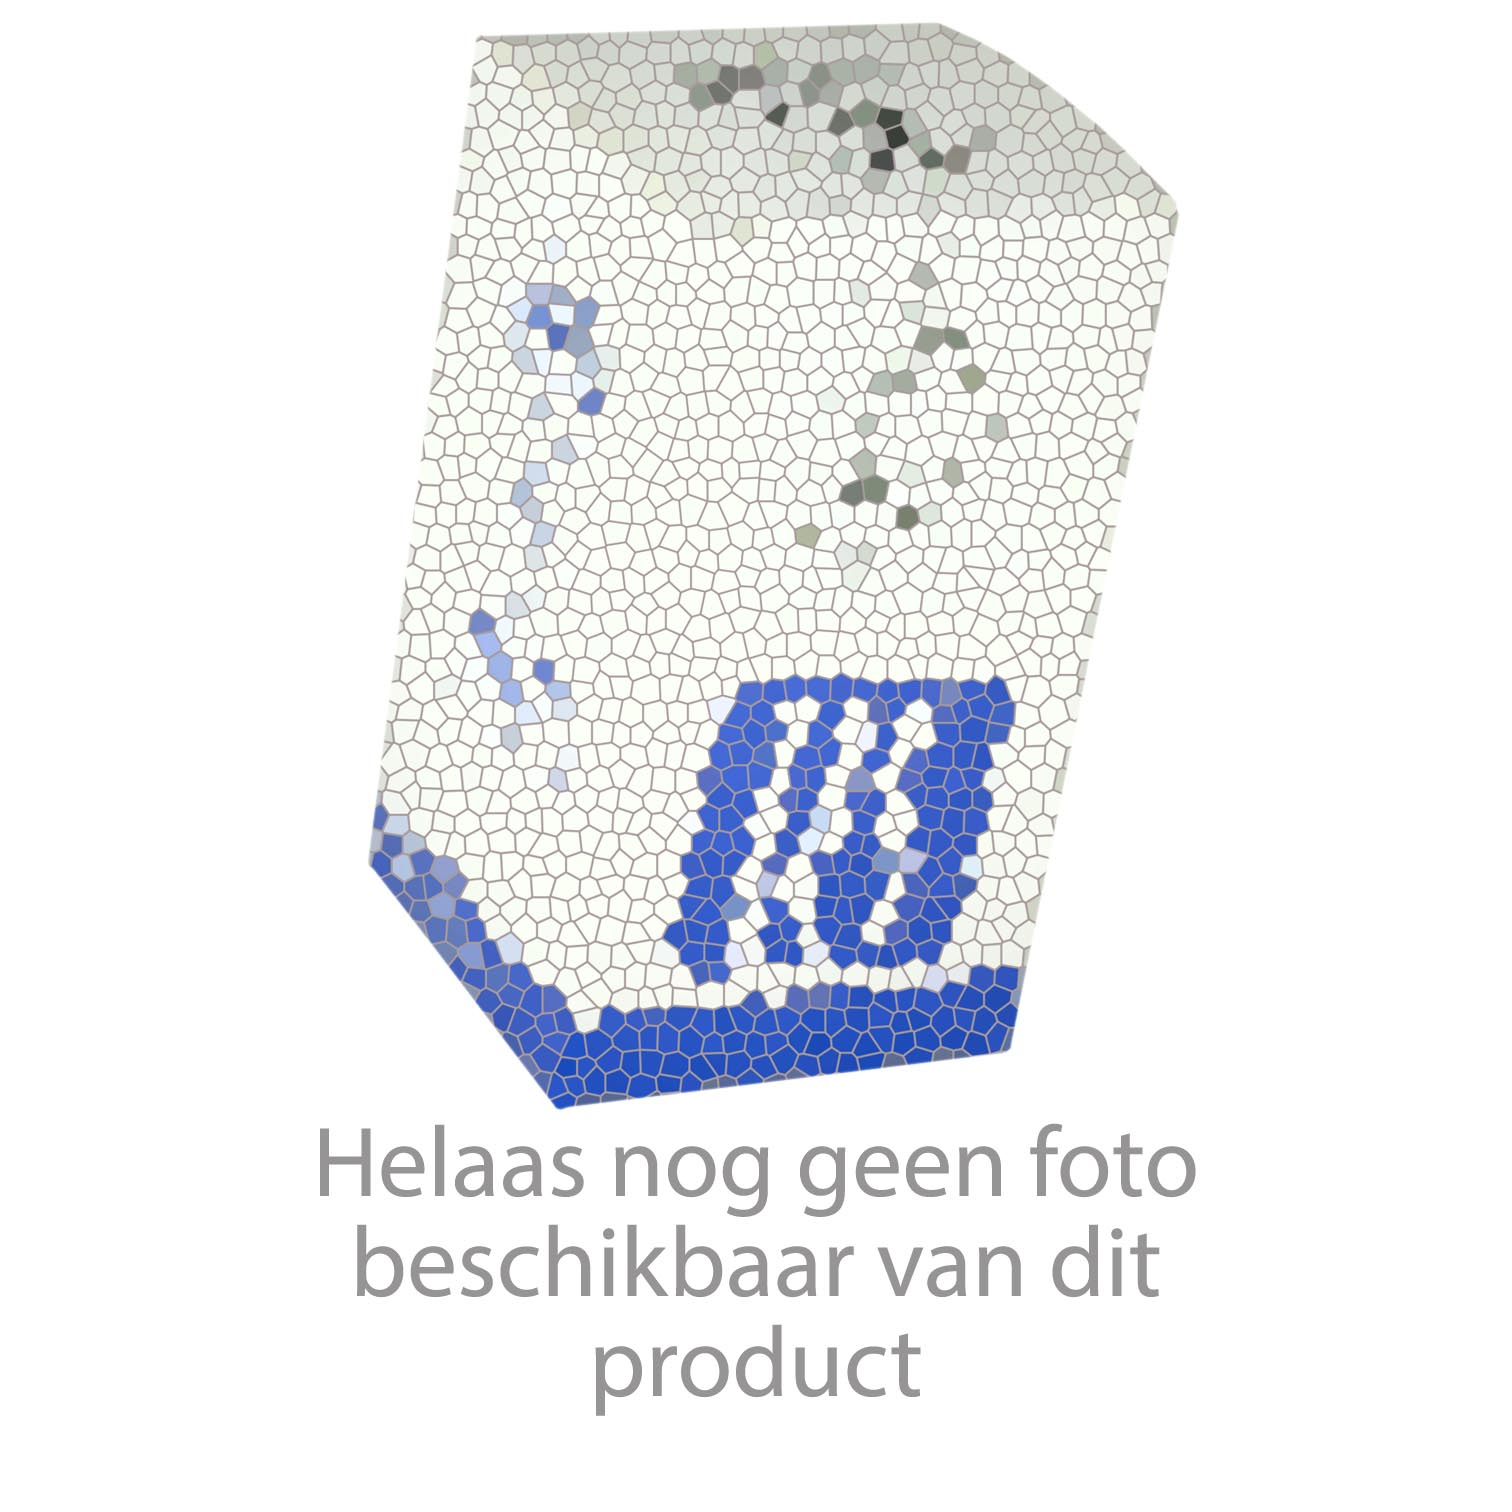 Echtermann EuroClean wandmodel met thermostaat tussenkraan op stijgpijp (h.o.h. 15cm) Artikel nummer 6438